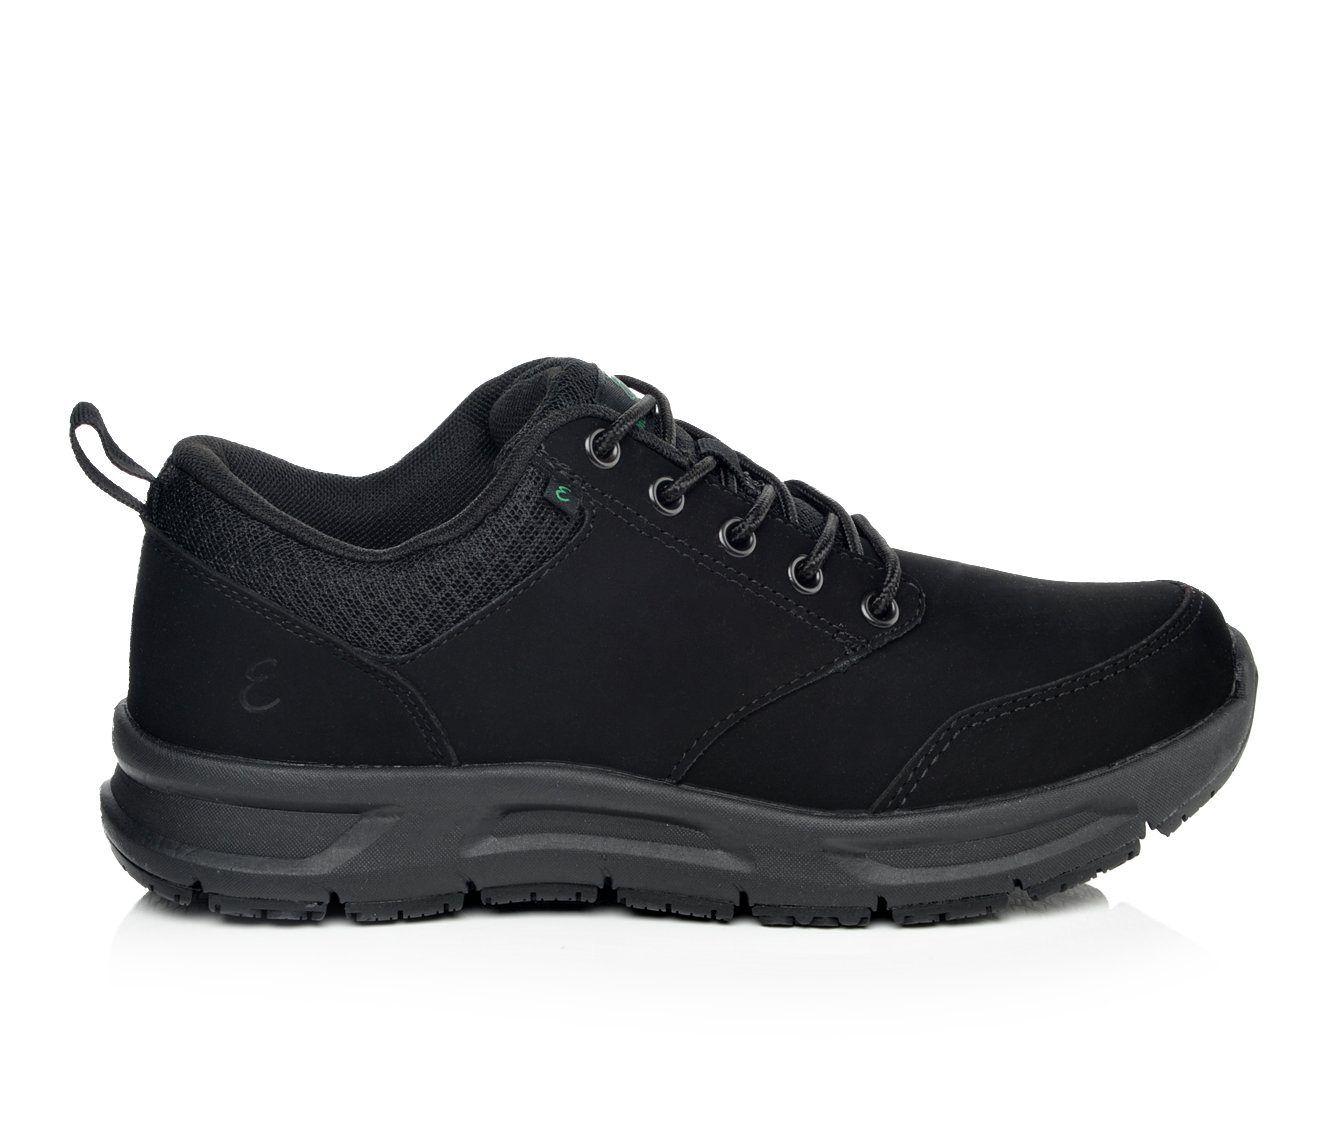 with mastercard buy cheap websites Men's Emeril Lagasse Quarter Nubuck Mesh Men's Safety Shoes buy cheap 2015 buy cheap best wholesale pSYKrKNN